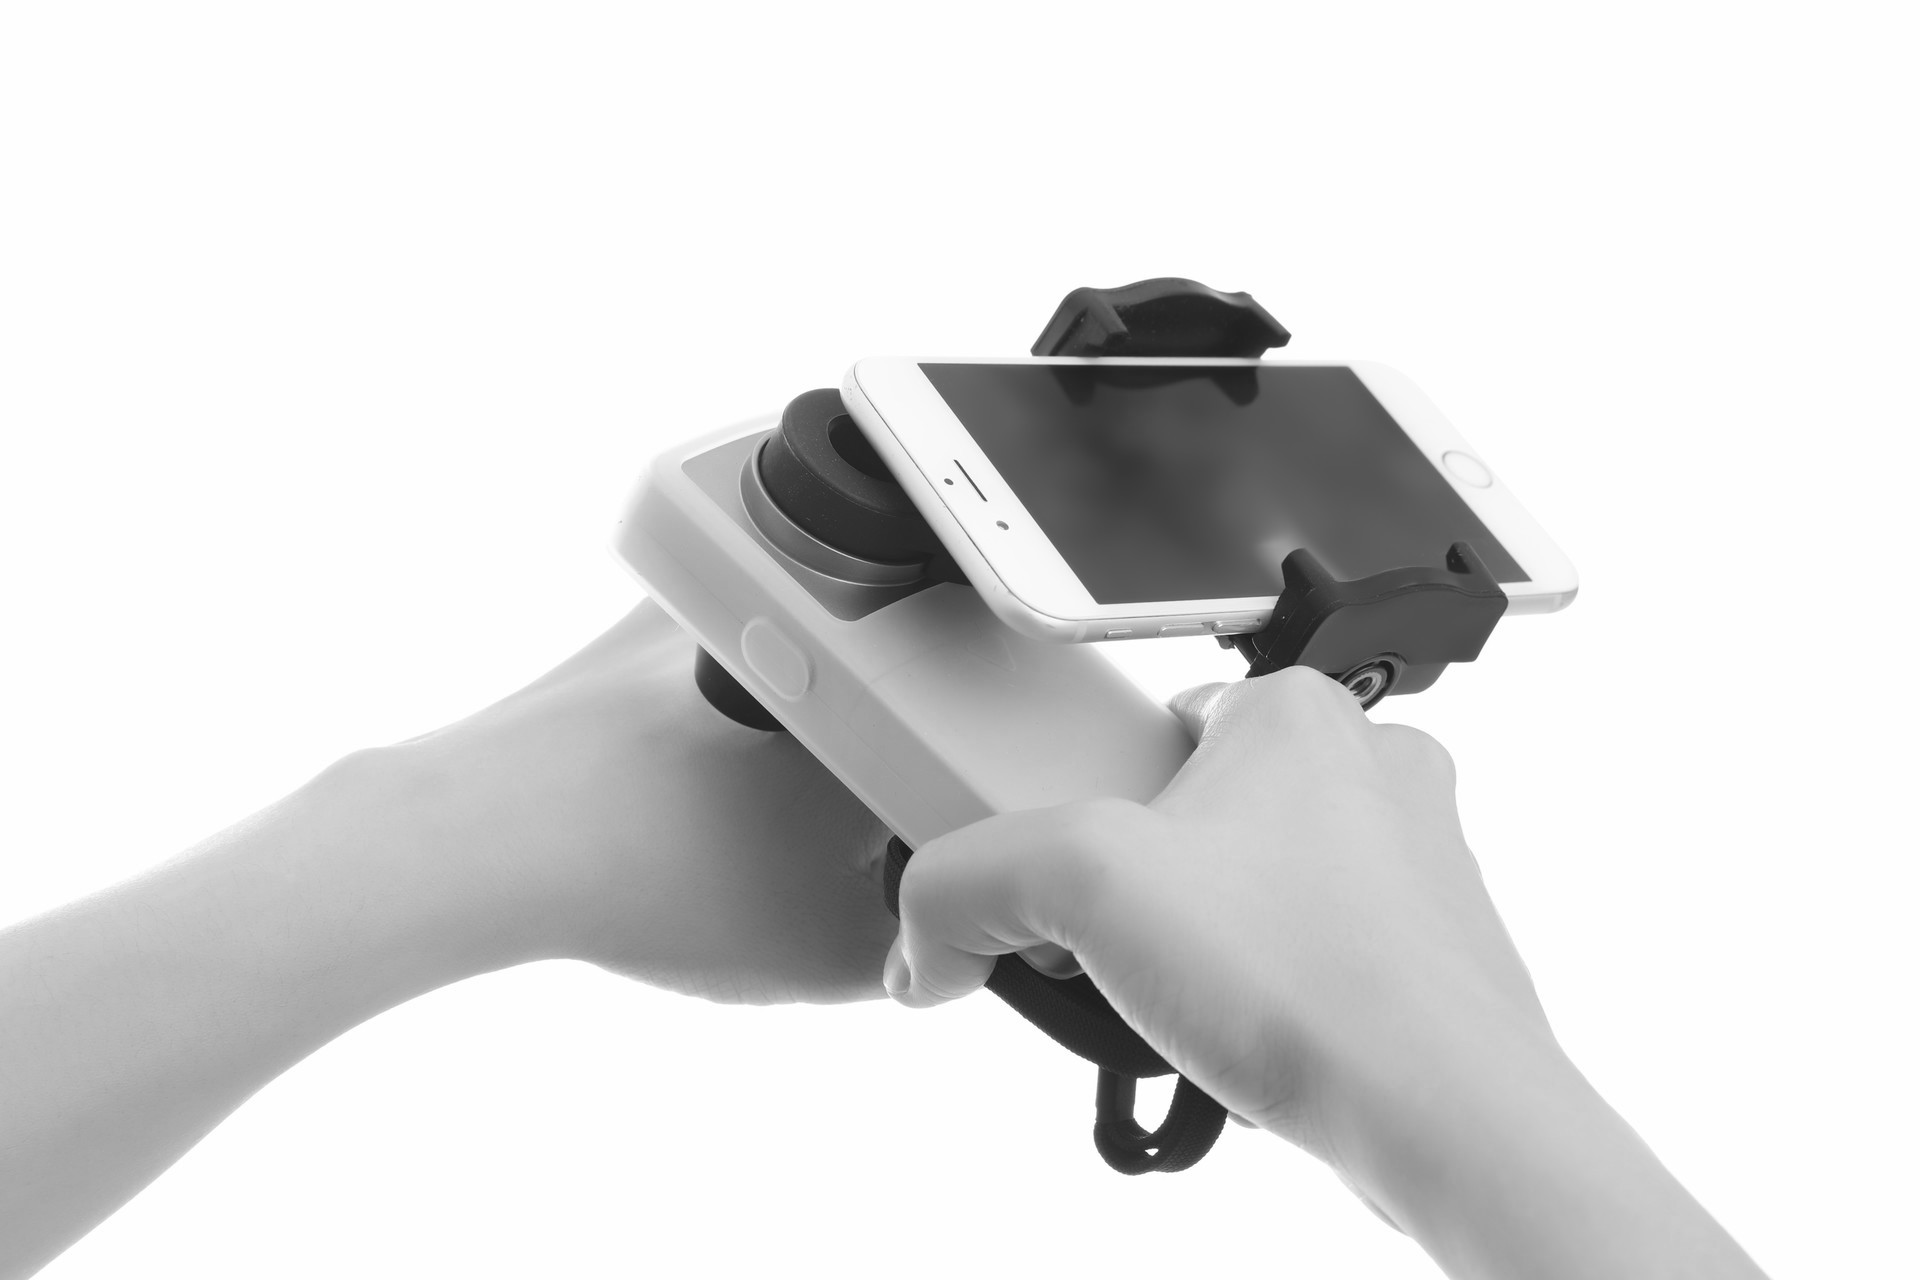 Universal Smartphone Adapter (IDS-1100 / IDS-1100C / IDS-1000Plus)